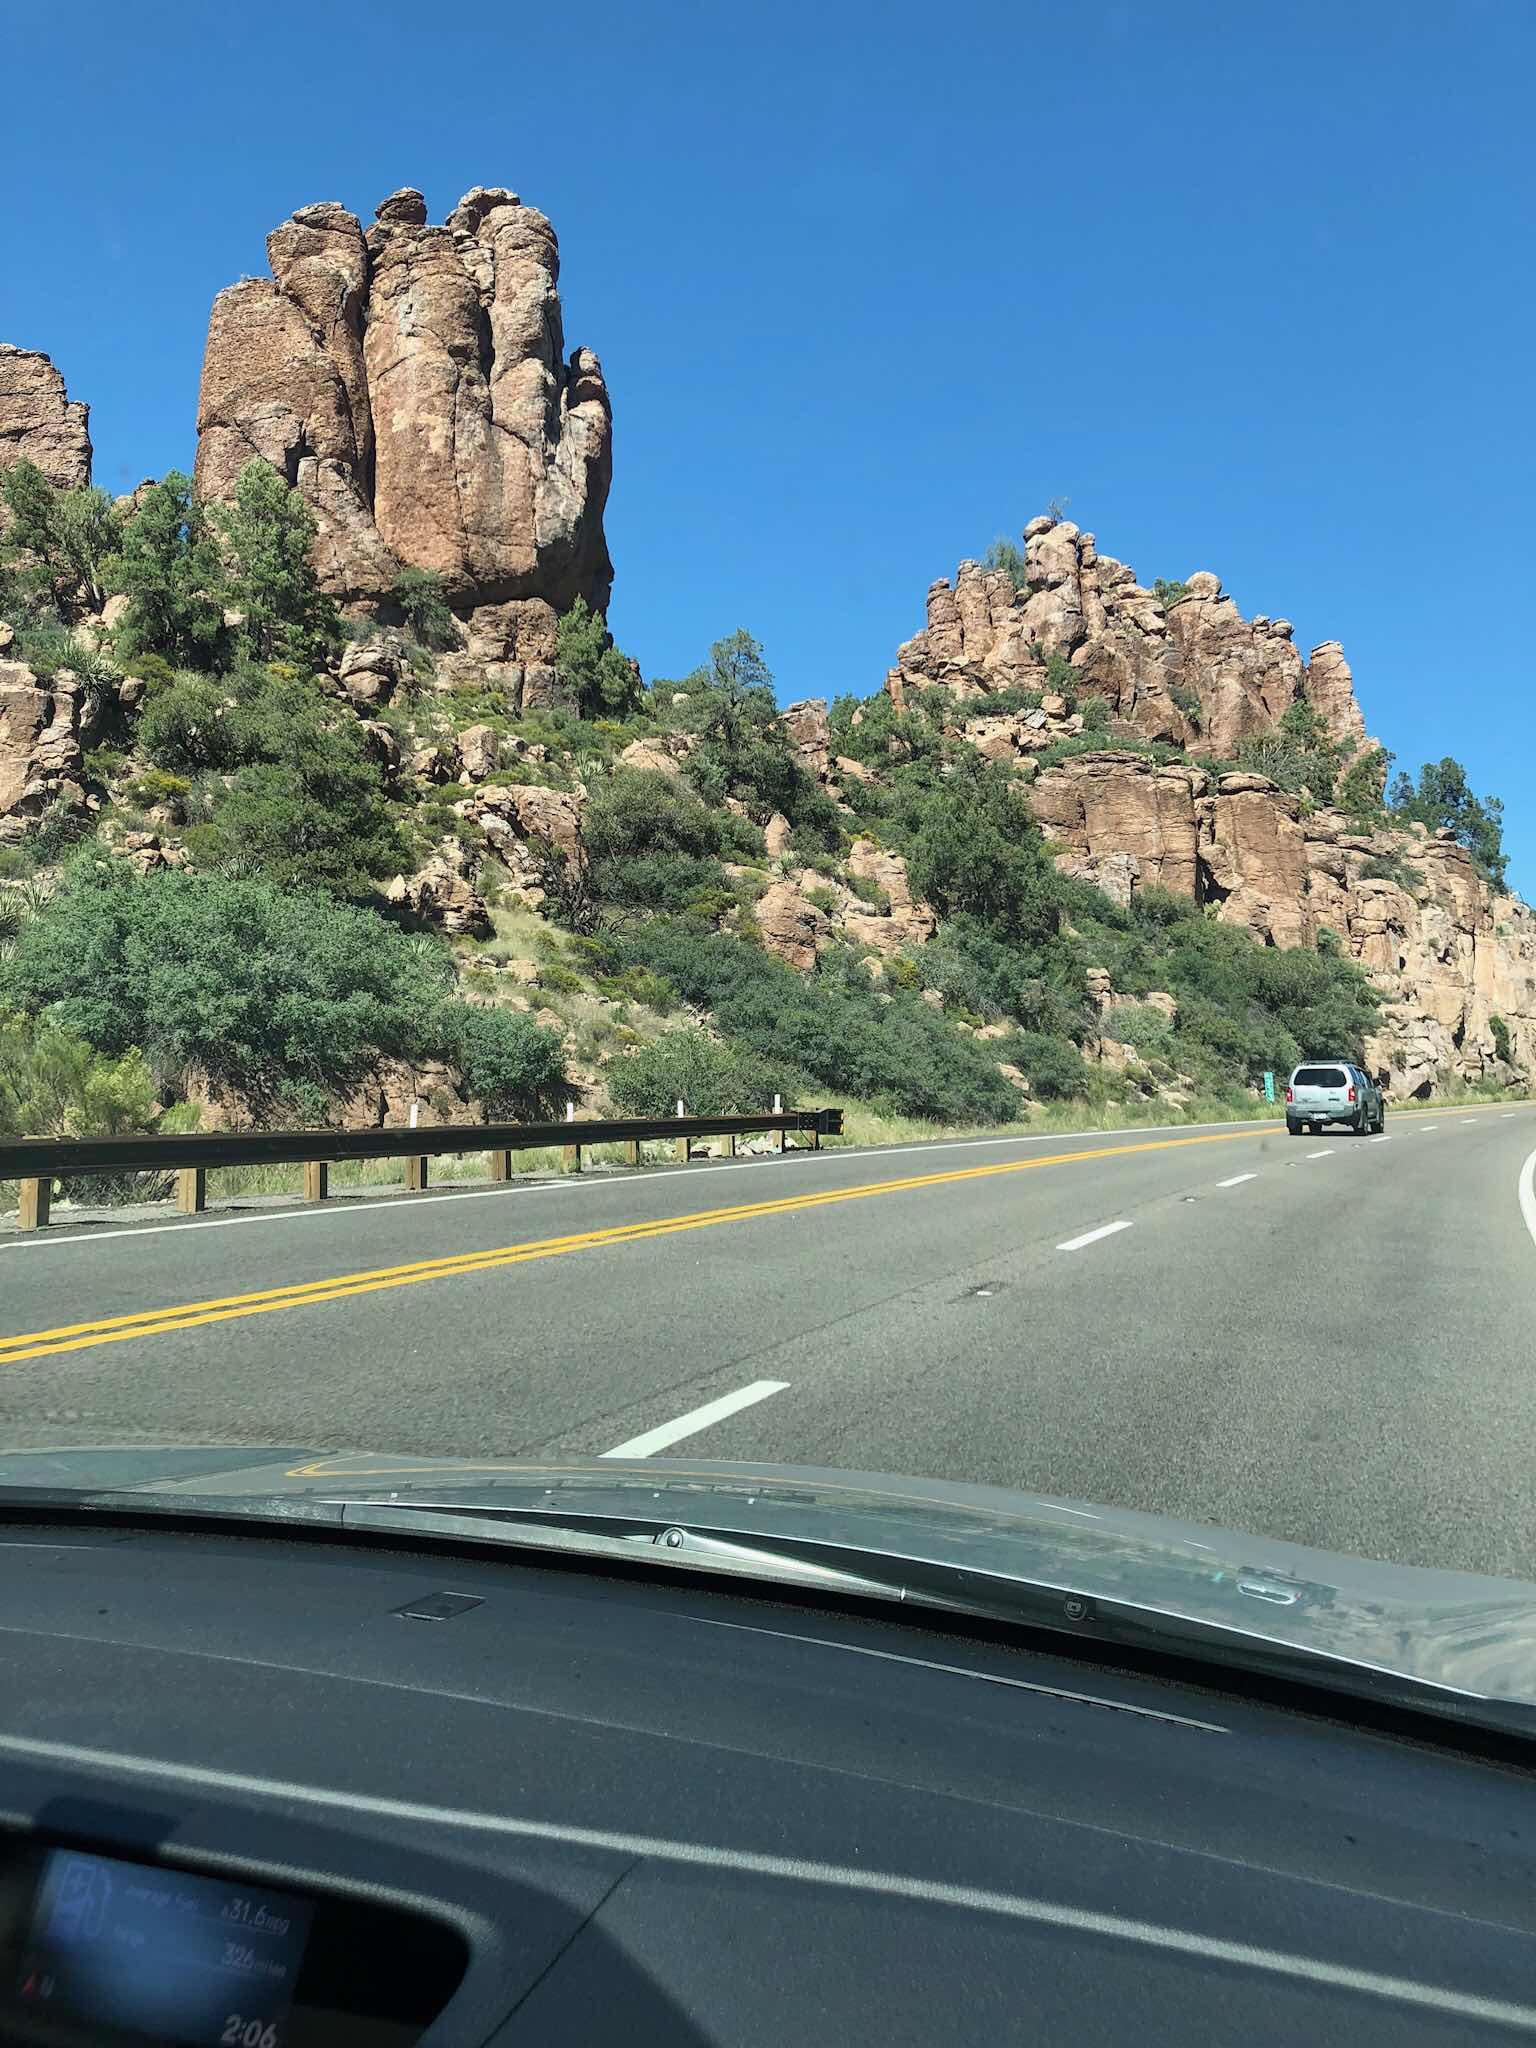 Driving from Phoenix to Safford, Arizona